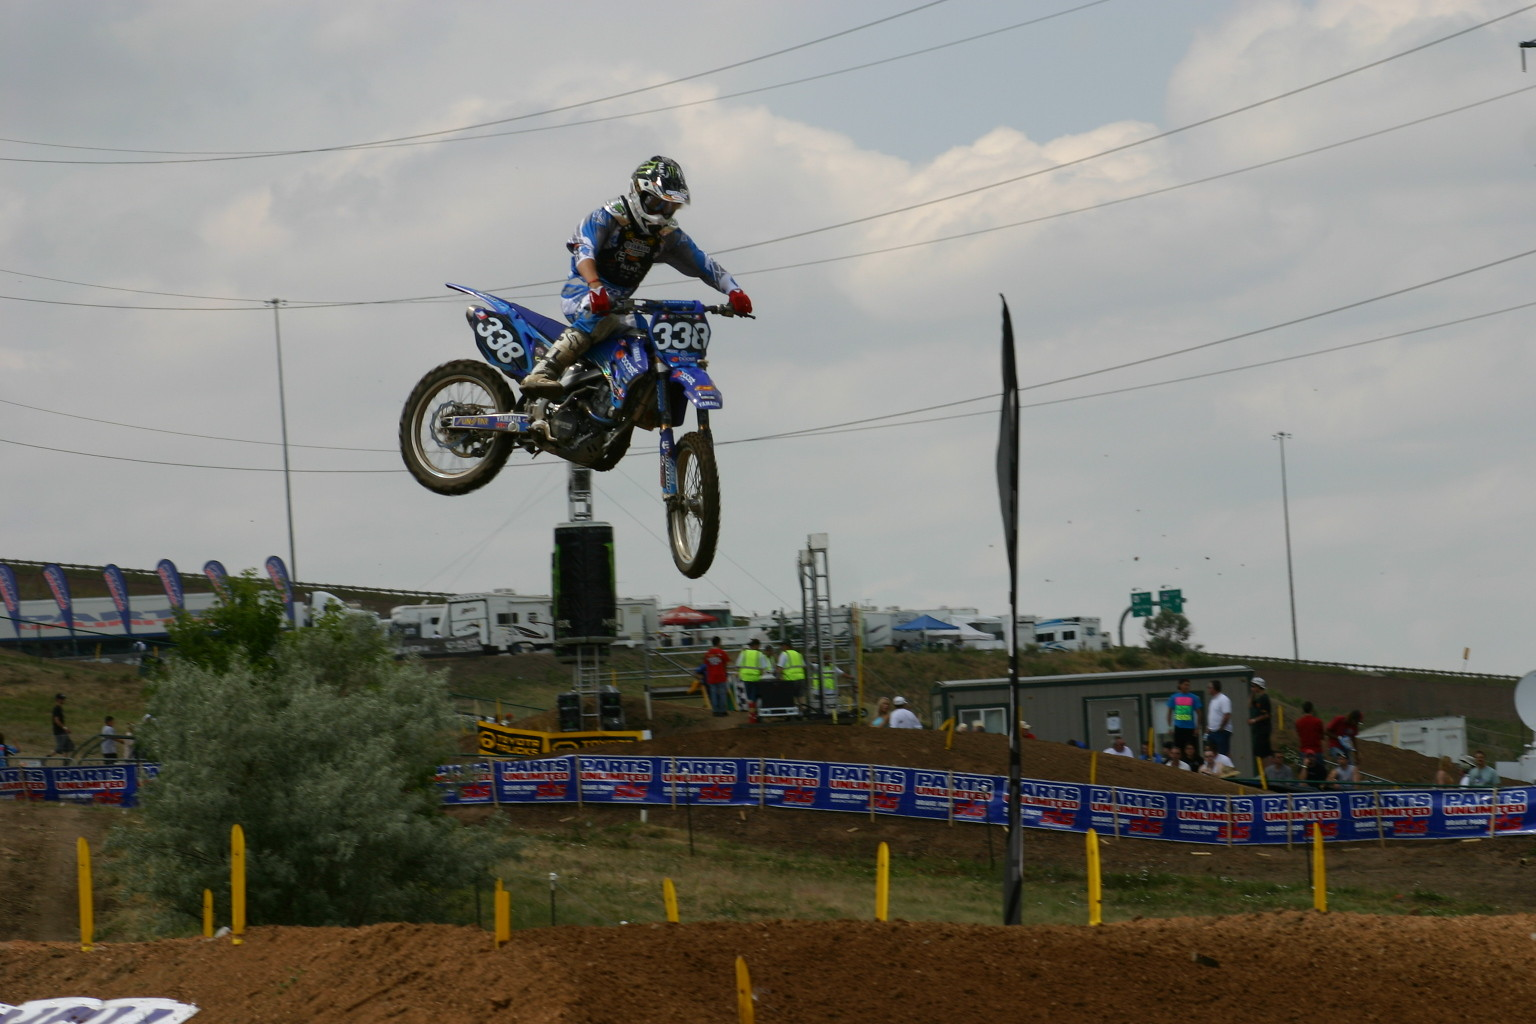 J-Law timed qualifier - jtomasik - Motocross Pictures - Vital MX